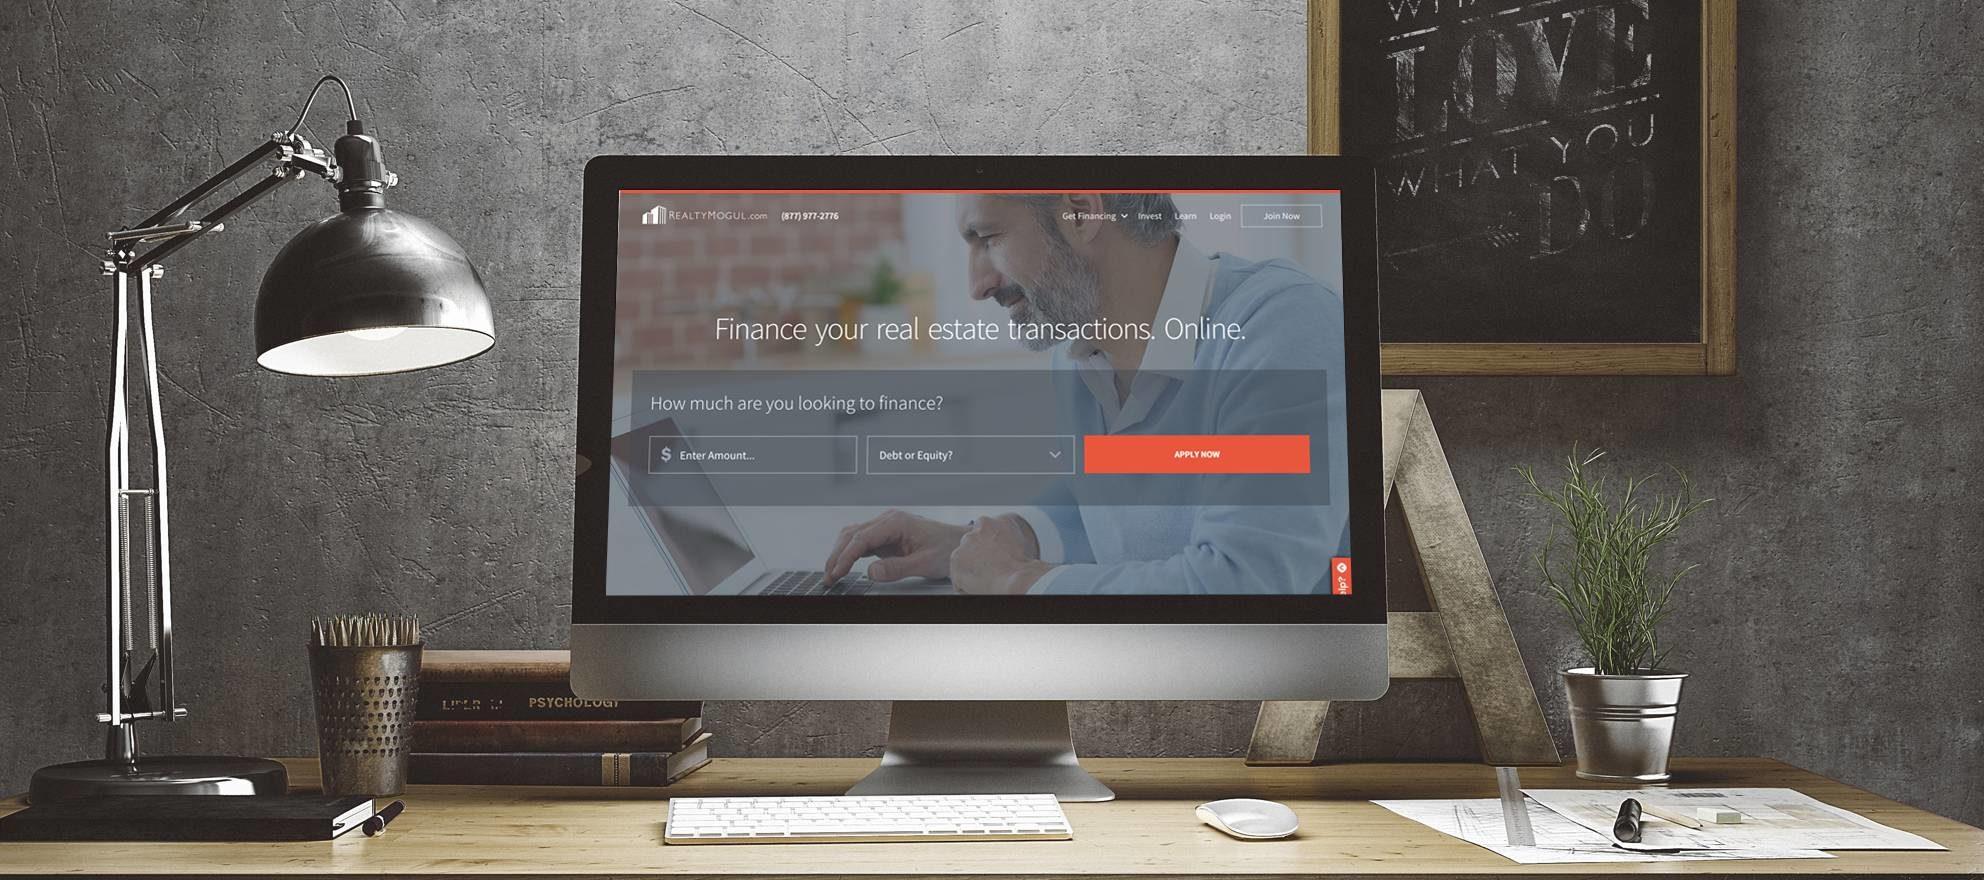 RealtyMogul.com raises $35M in latest bet on new financing method